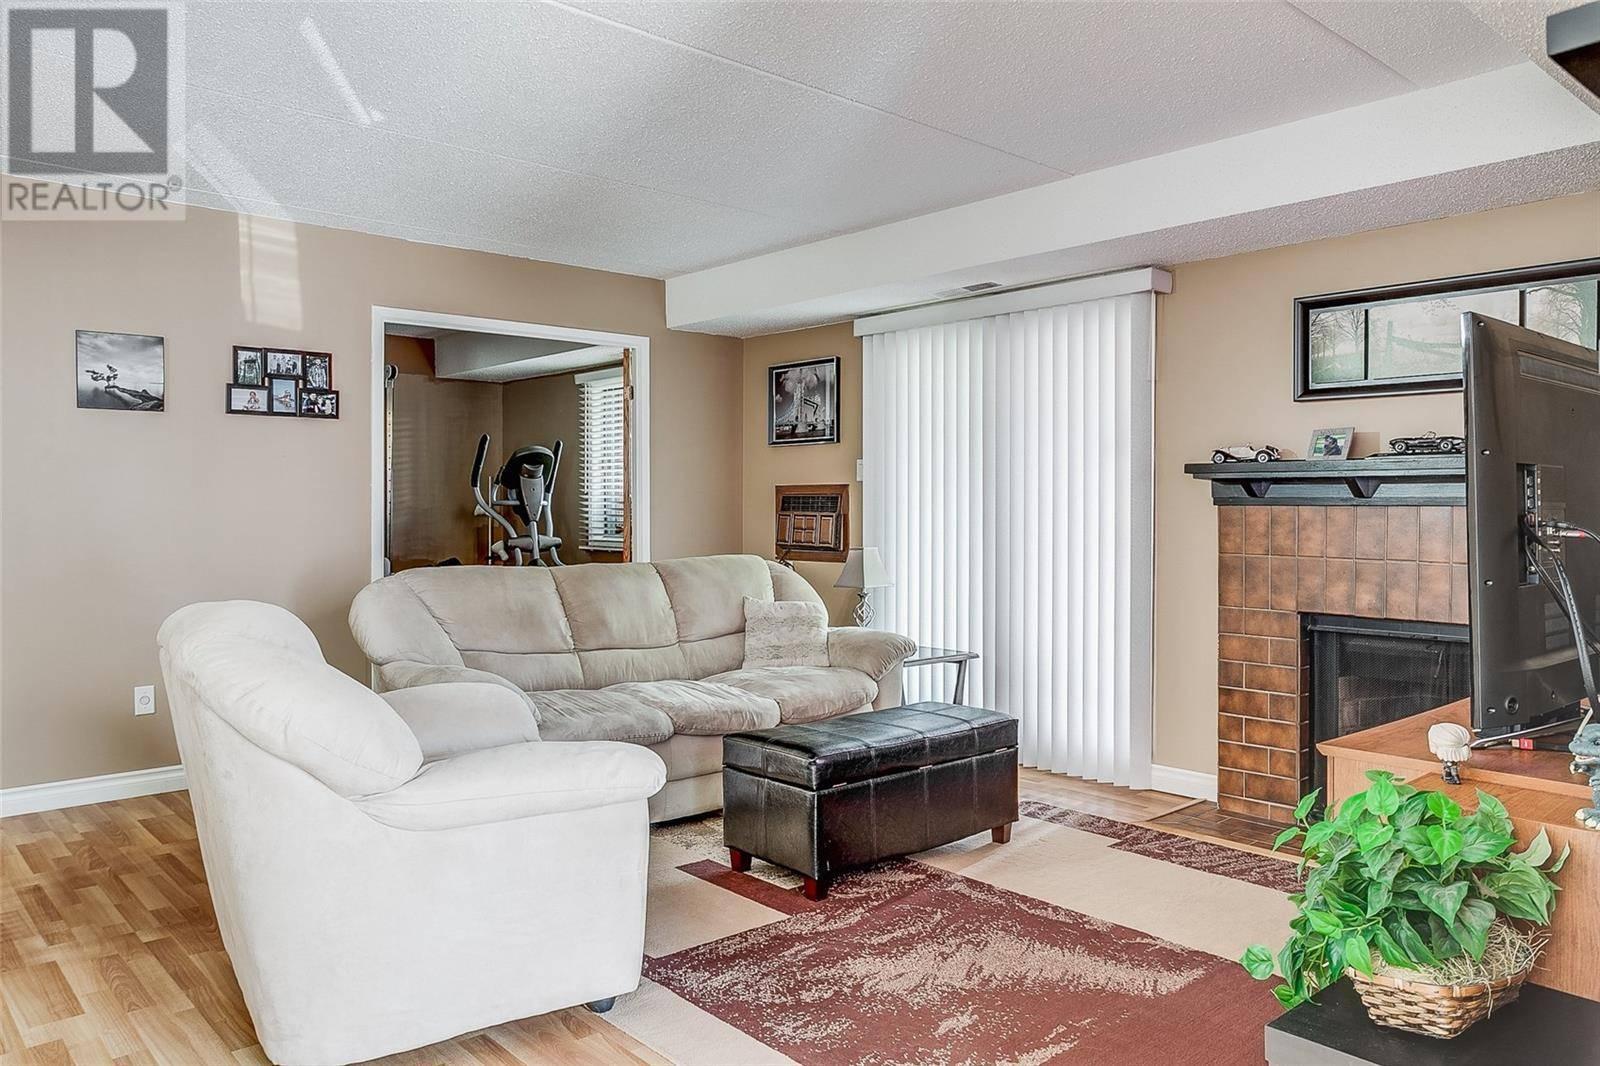 Condo for sale at 457 Pendygrasse Rd Unit 103 Saskatoon Saskatchewan - MLS: SK788097